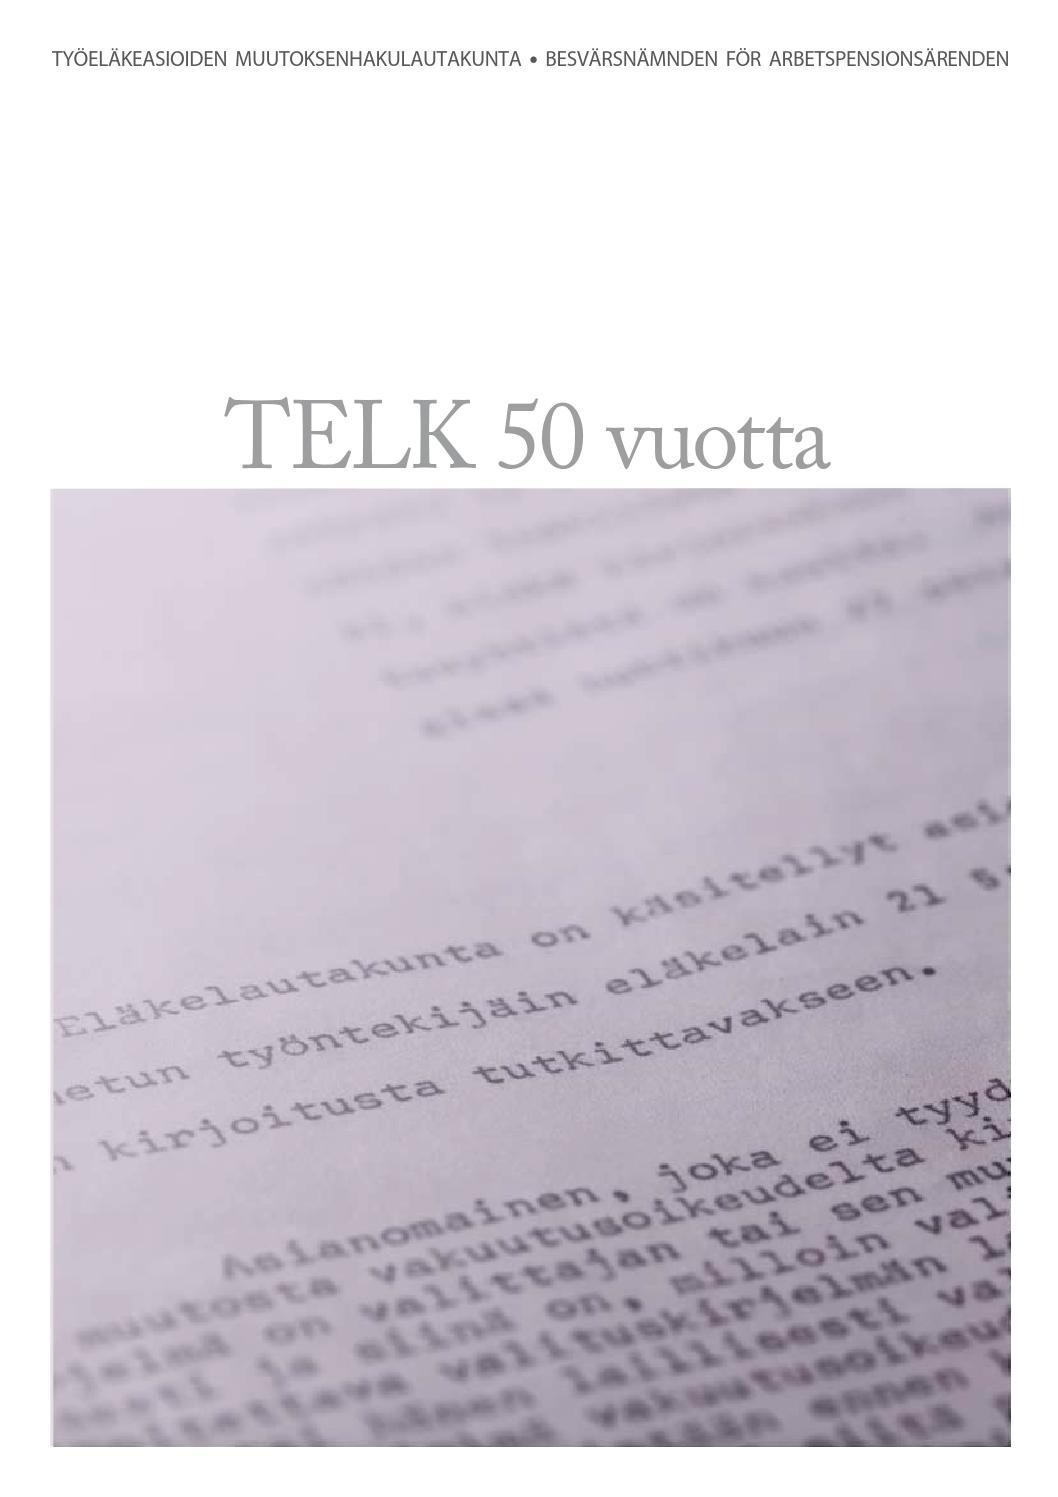 Telk 50vuotta lr by wksp - Issuu